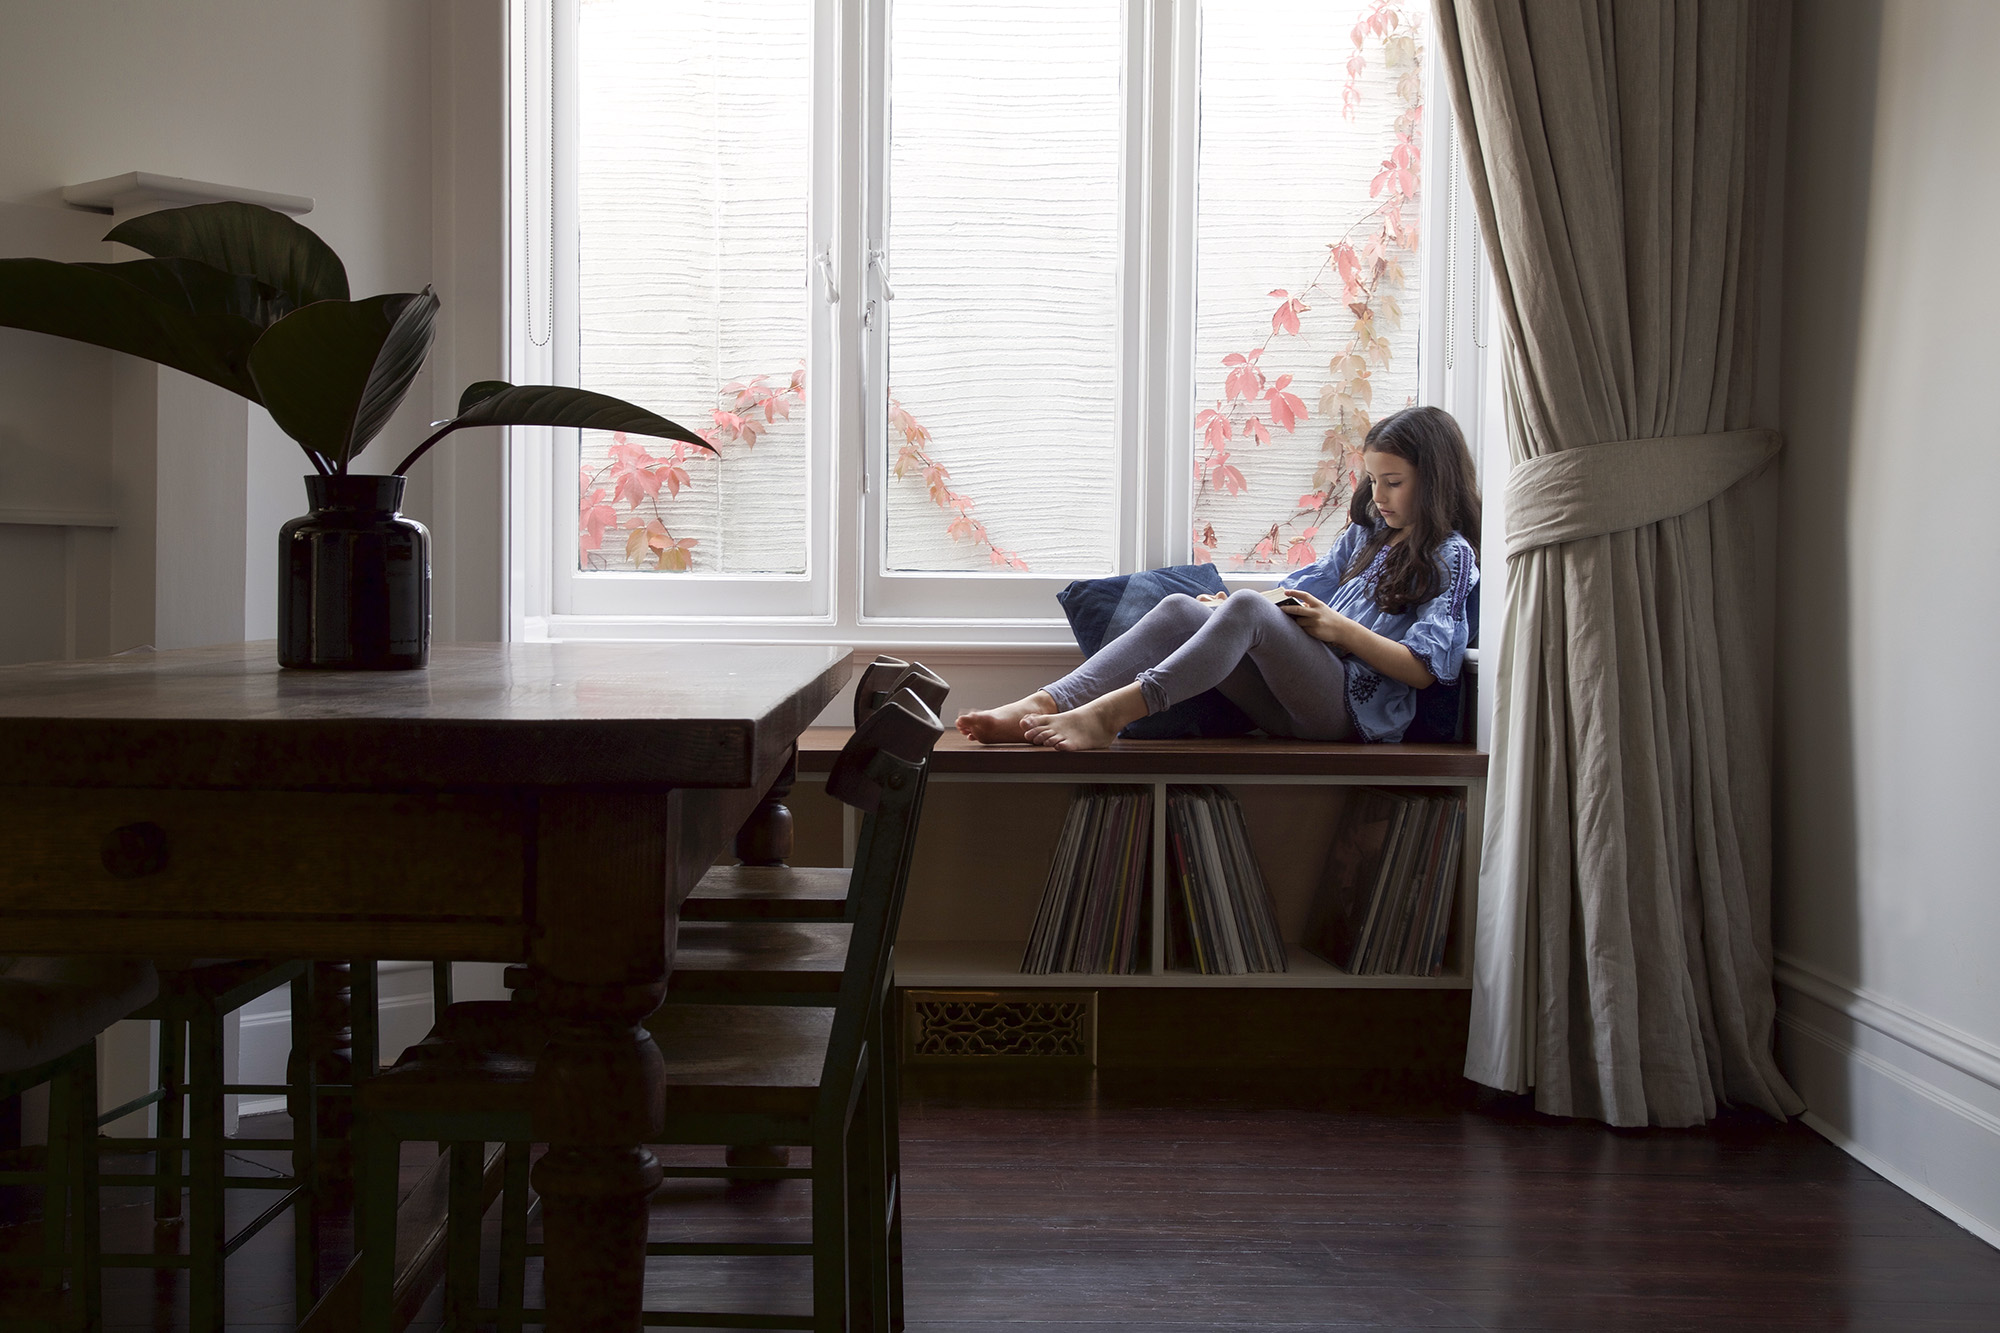 eco+interiors,+sustainable+interior+design,+sustainable+interiors (2).jpeg